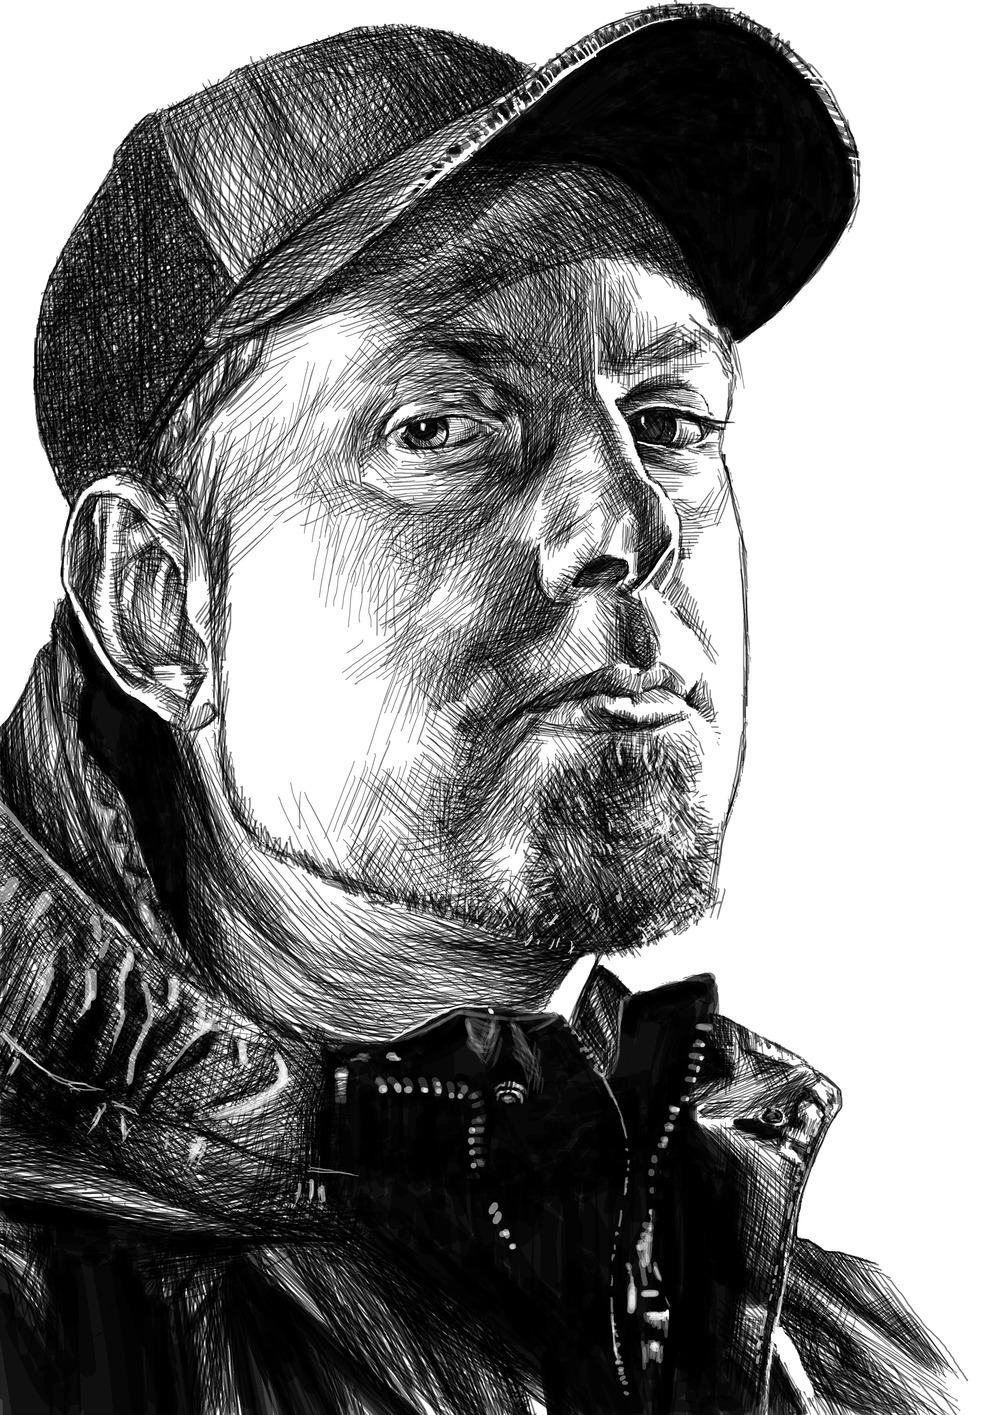 DJ Shadow Pencils 300dpi.jpg